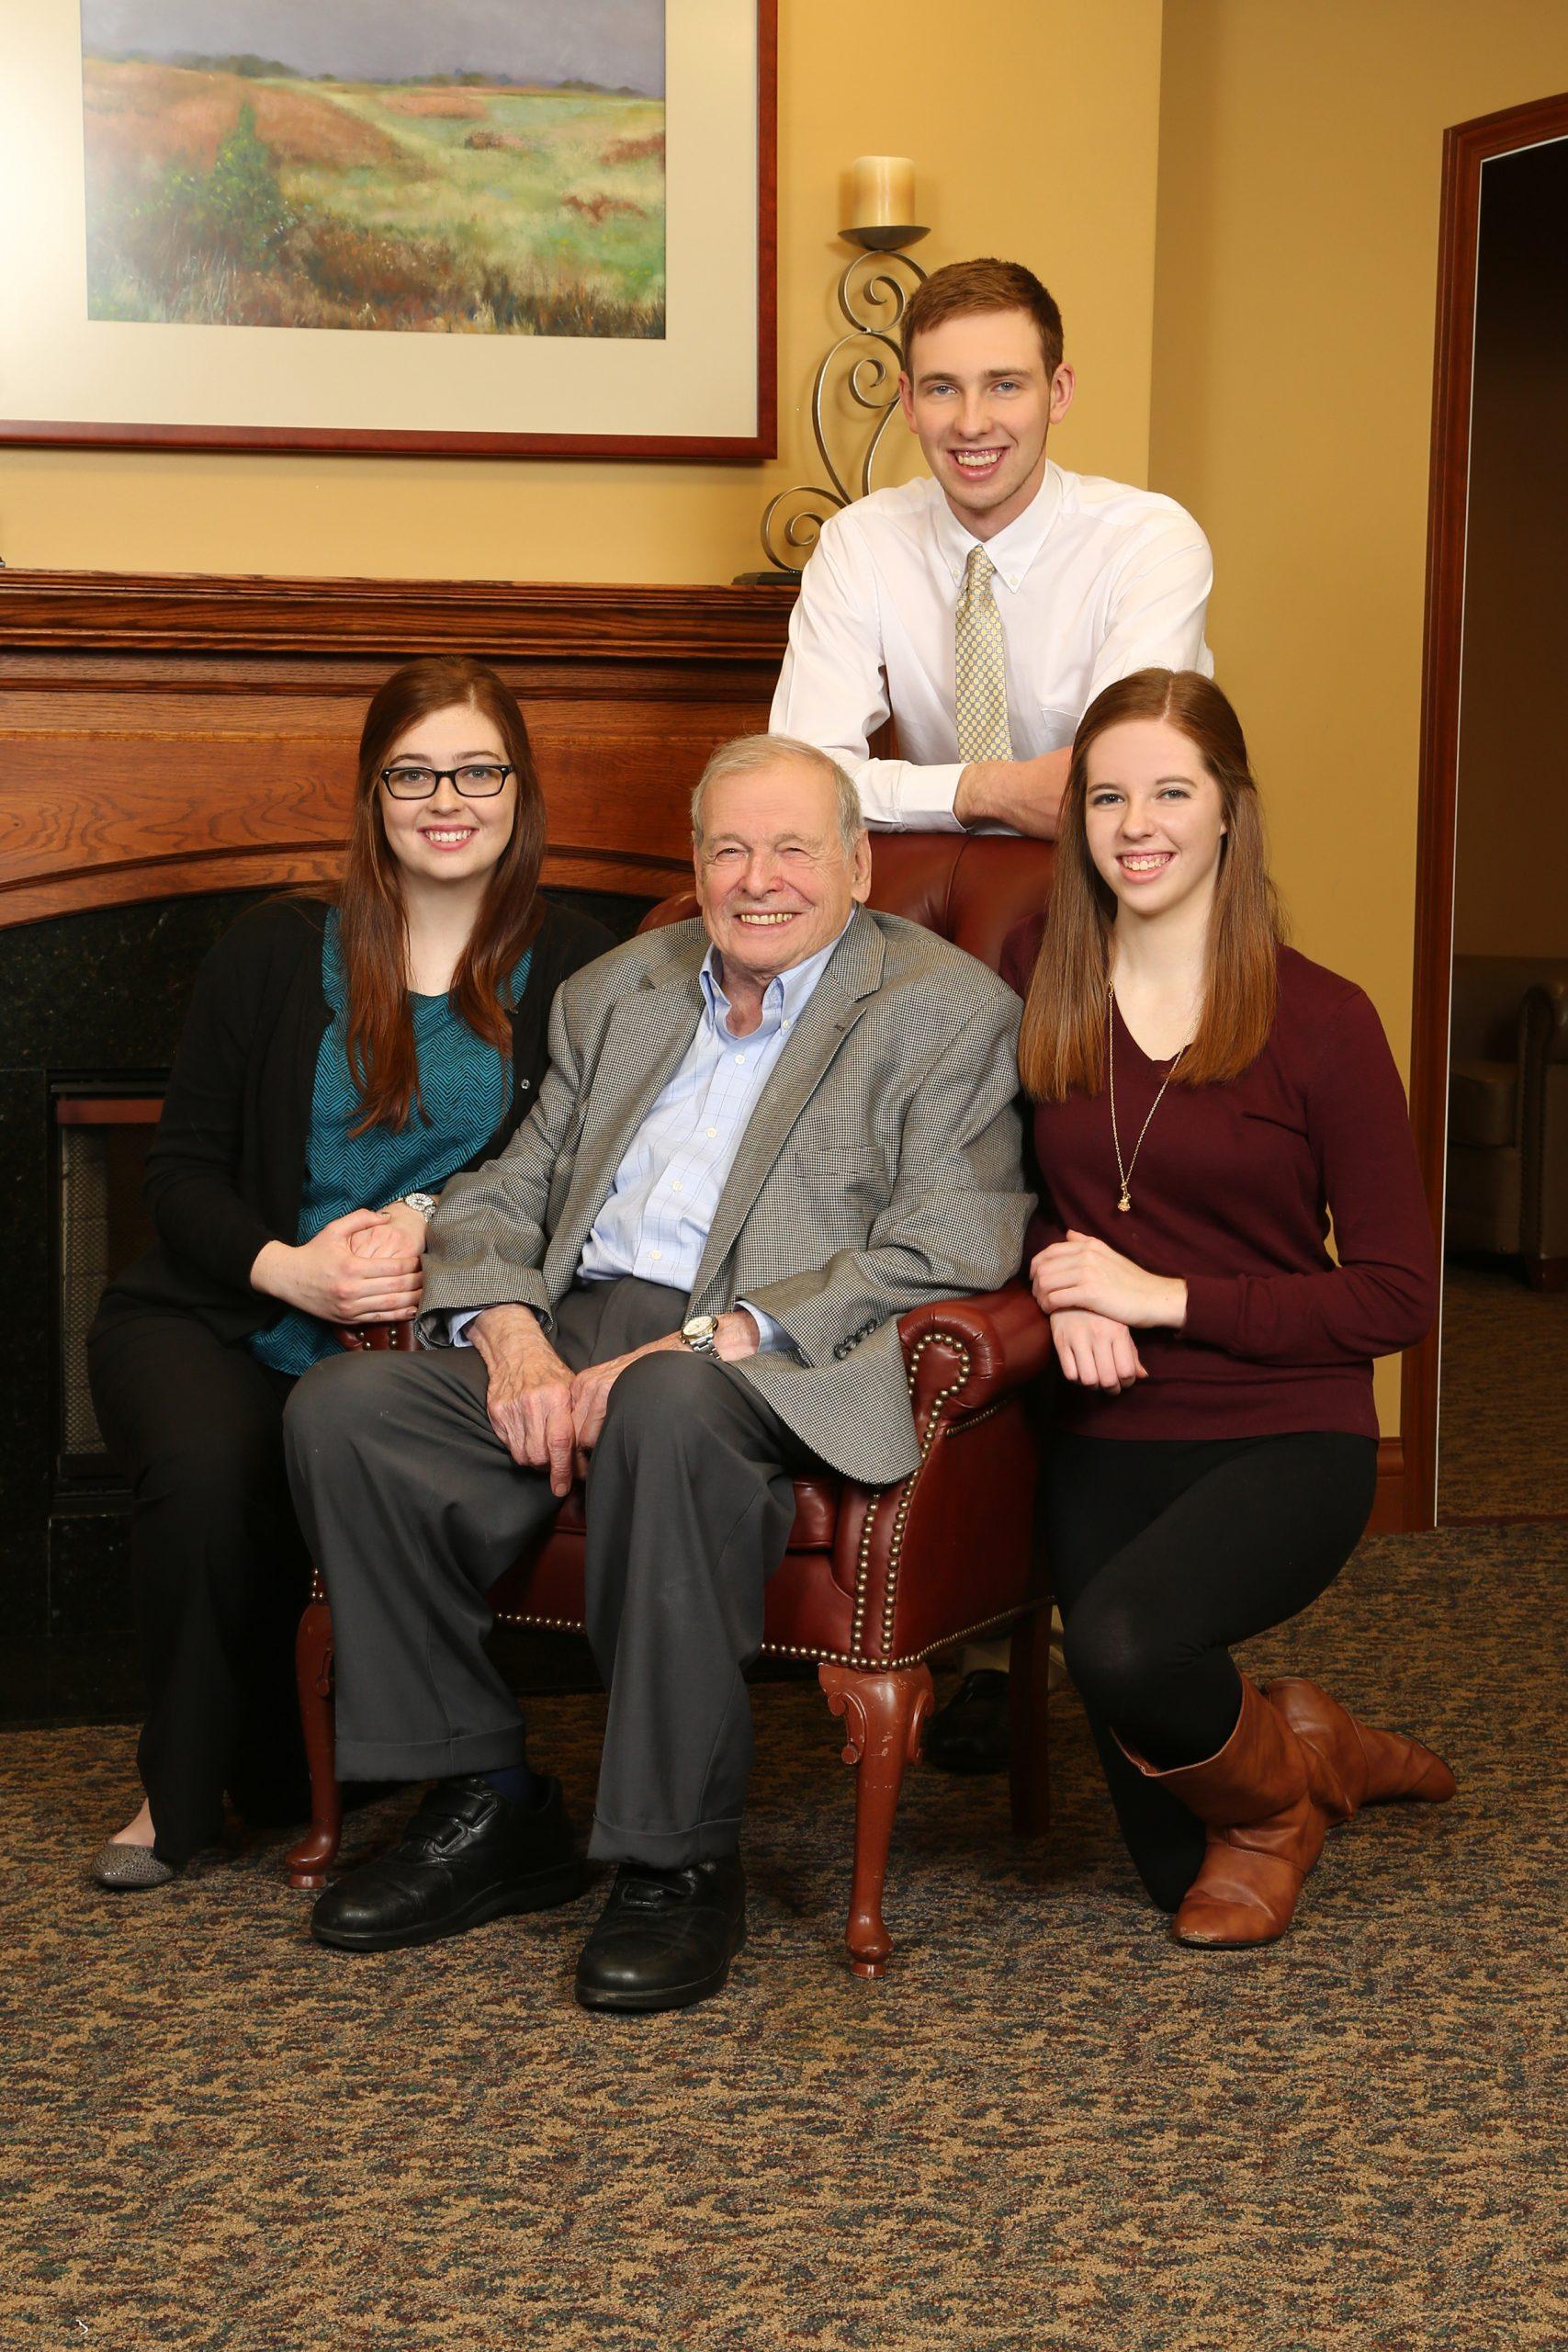 Peter Braunfeld and his grandchildren